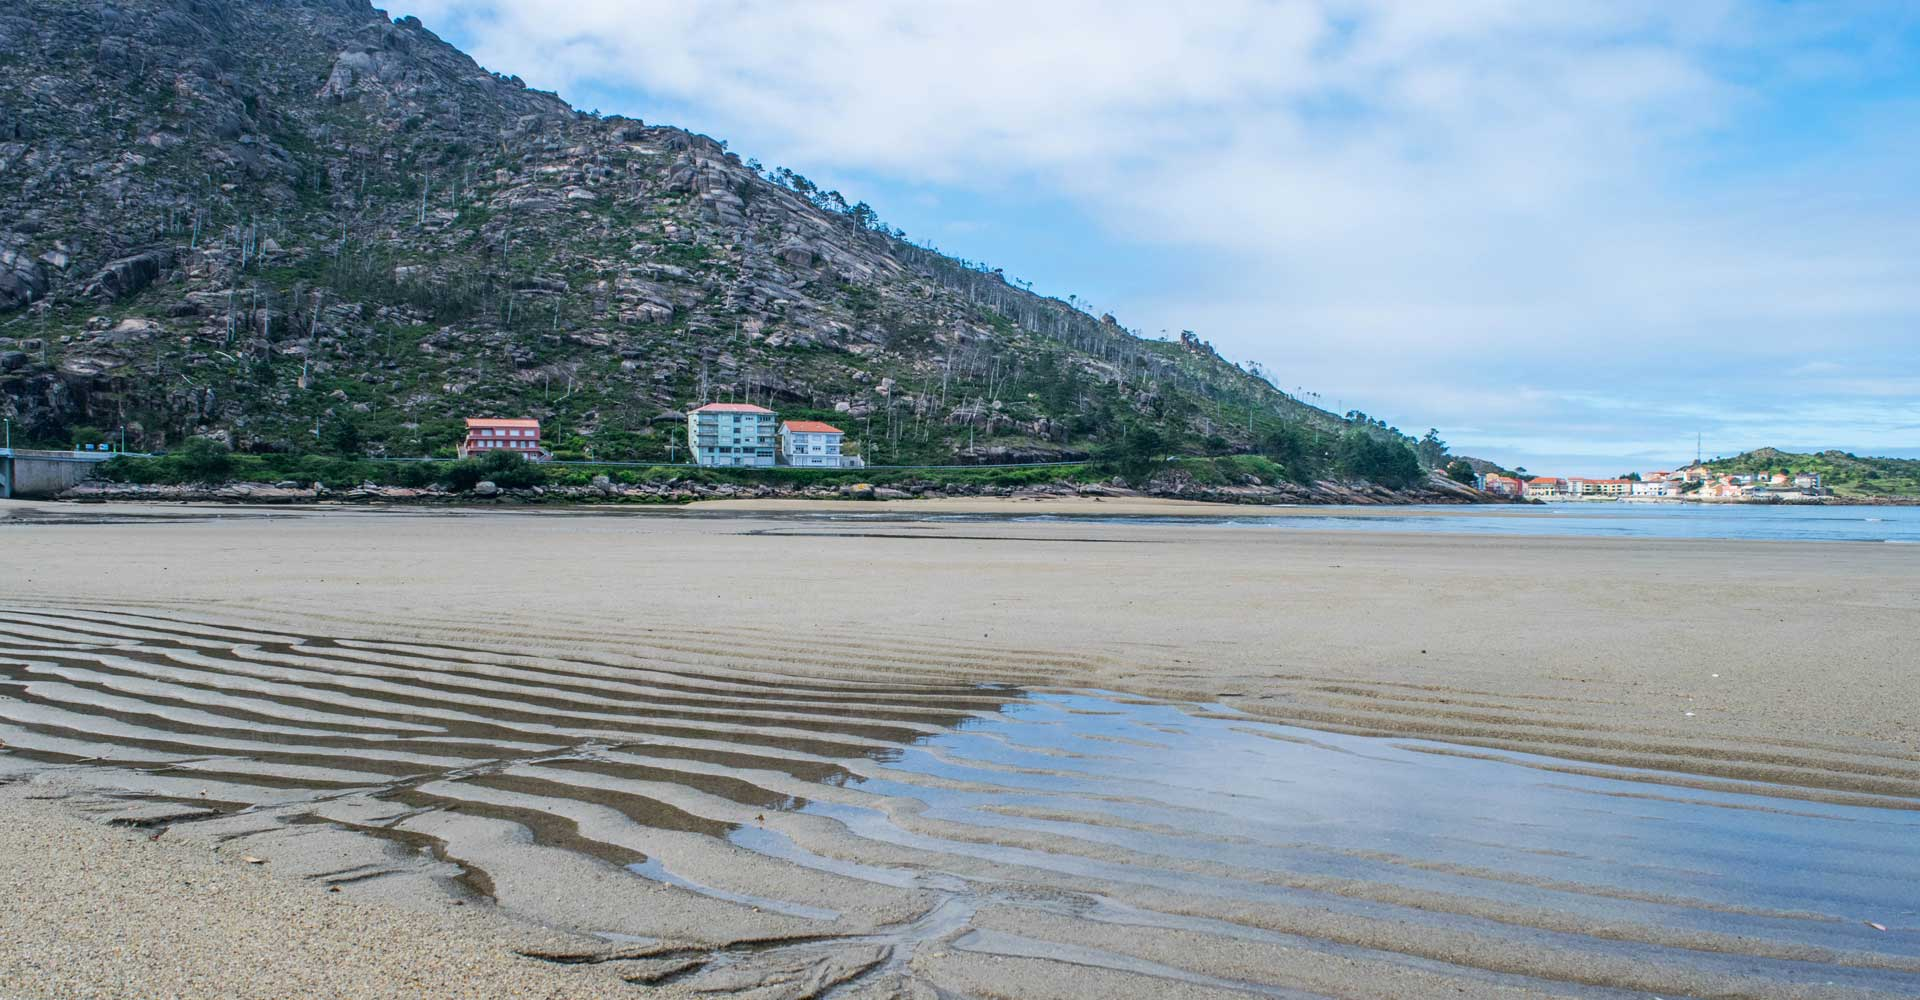 Turismo en Ézaro, A Costa da Morte - Playa del Ézaro